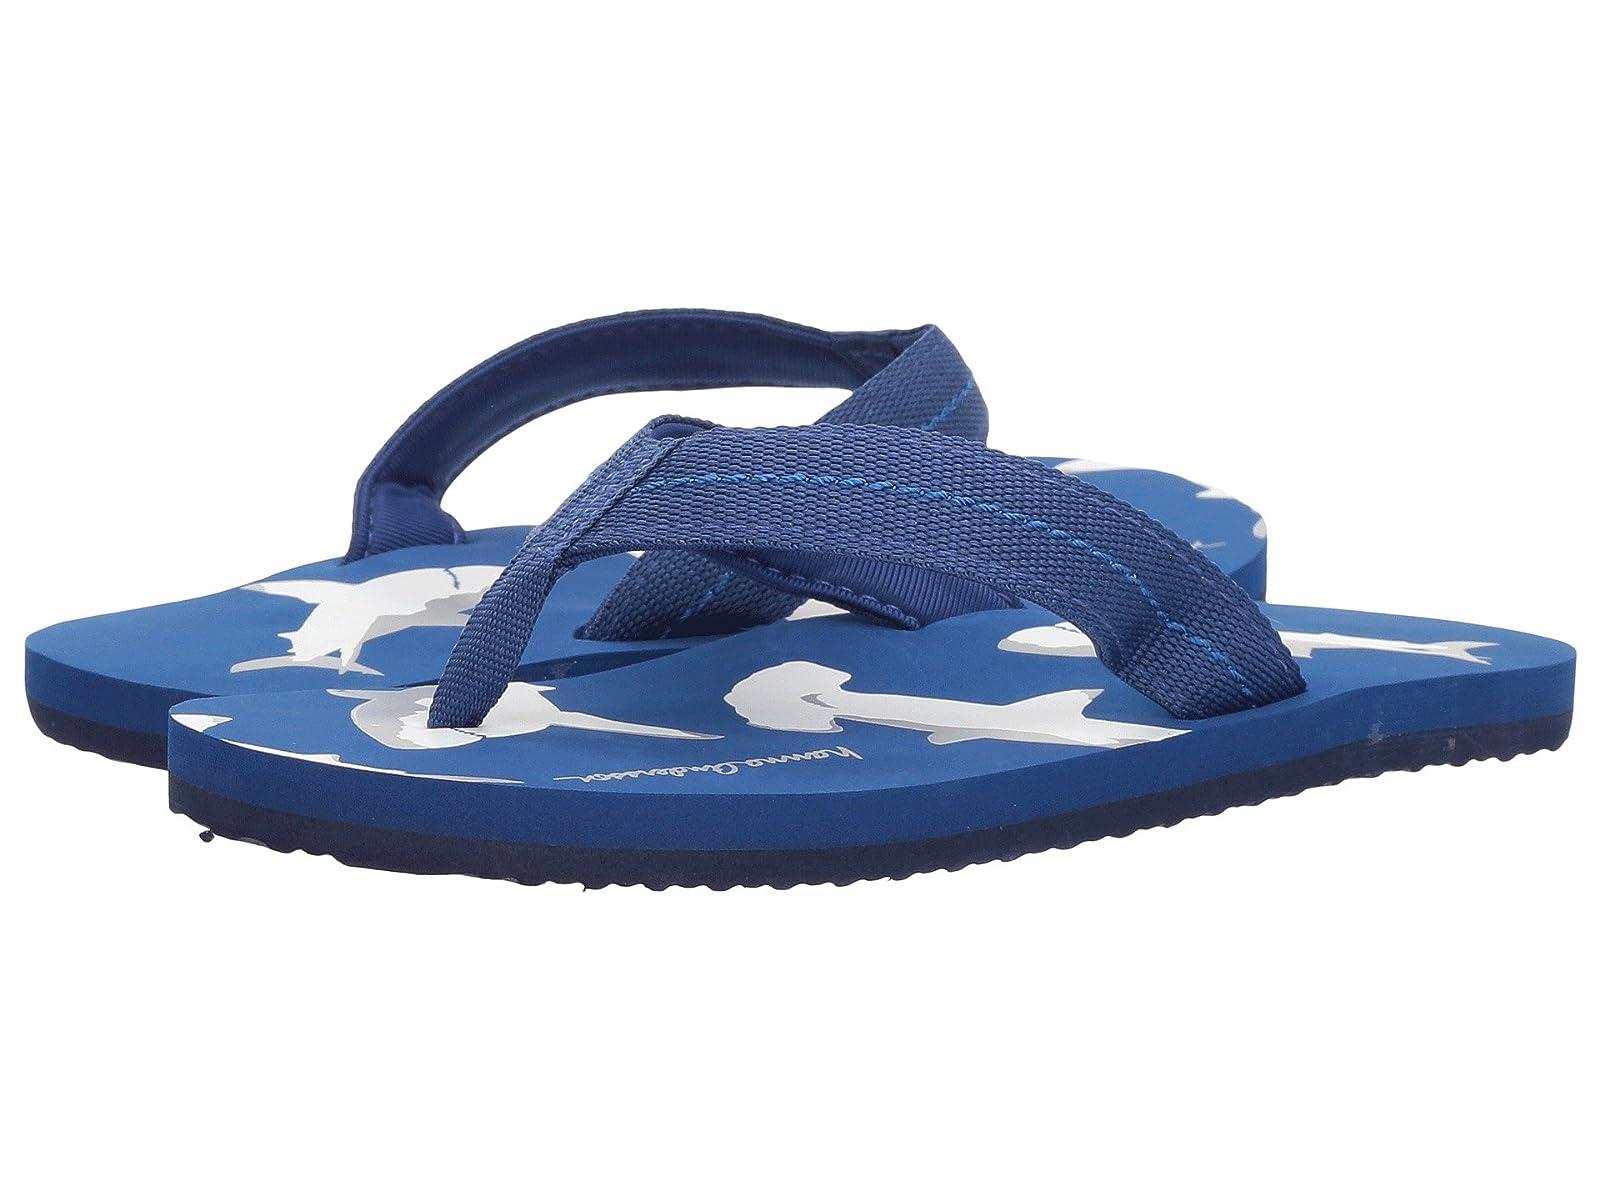 Hanna Andersson Sunny Day Flip Flops (Toddler/Little Kid/Big Kid)Atmospheric grades have affordable shoes